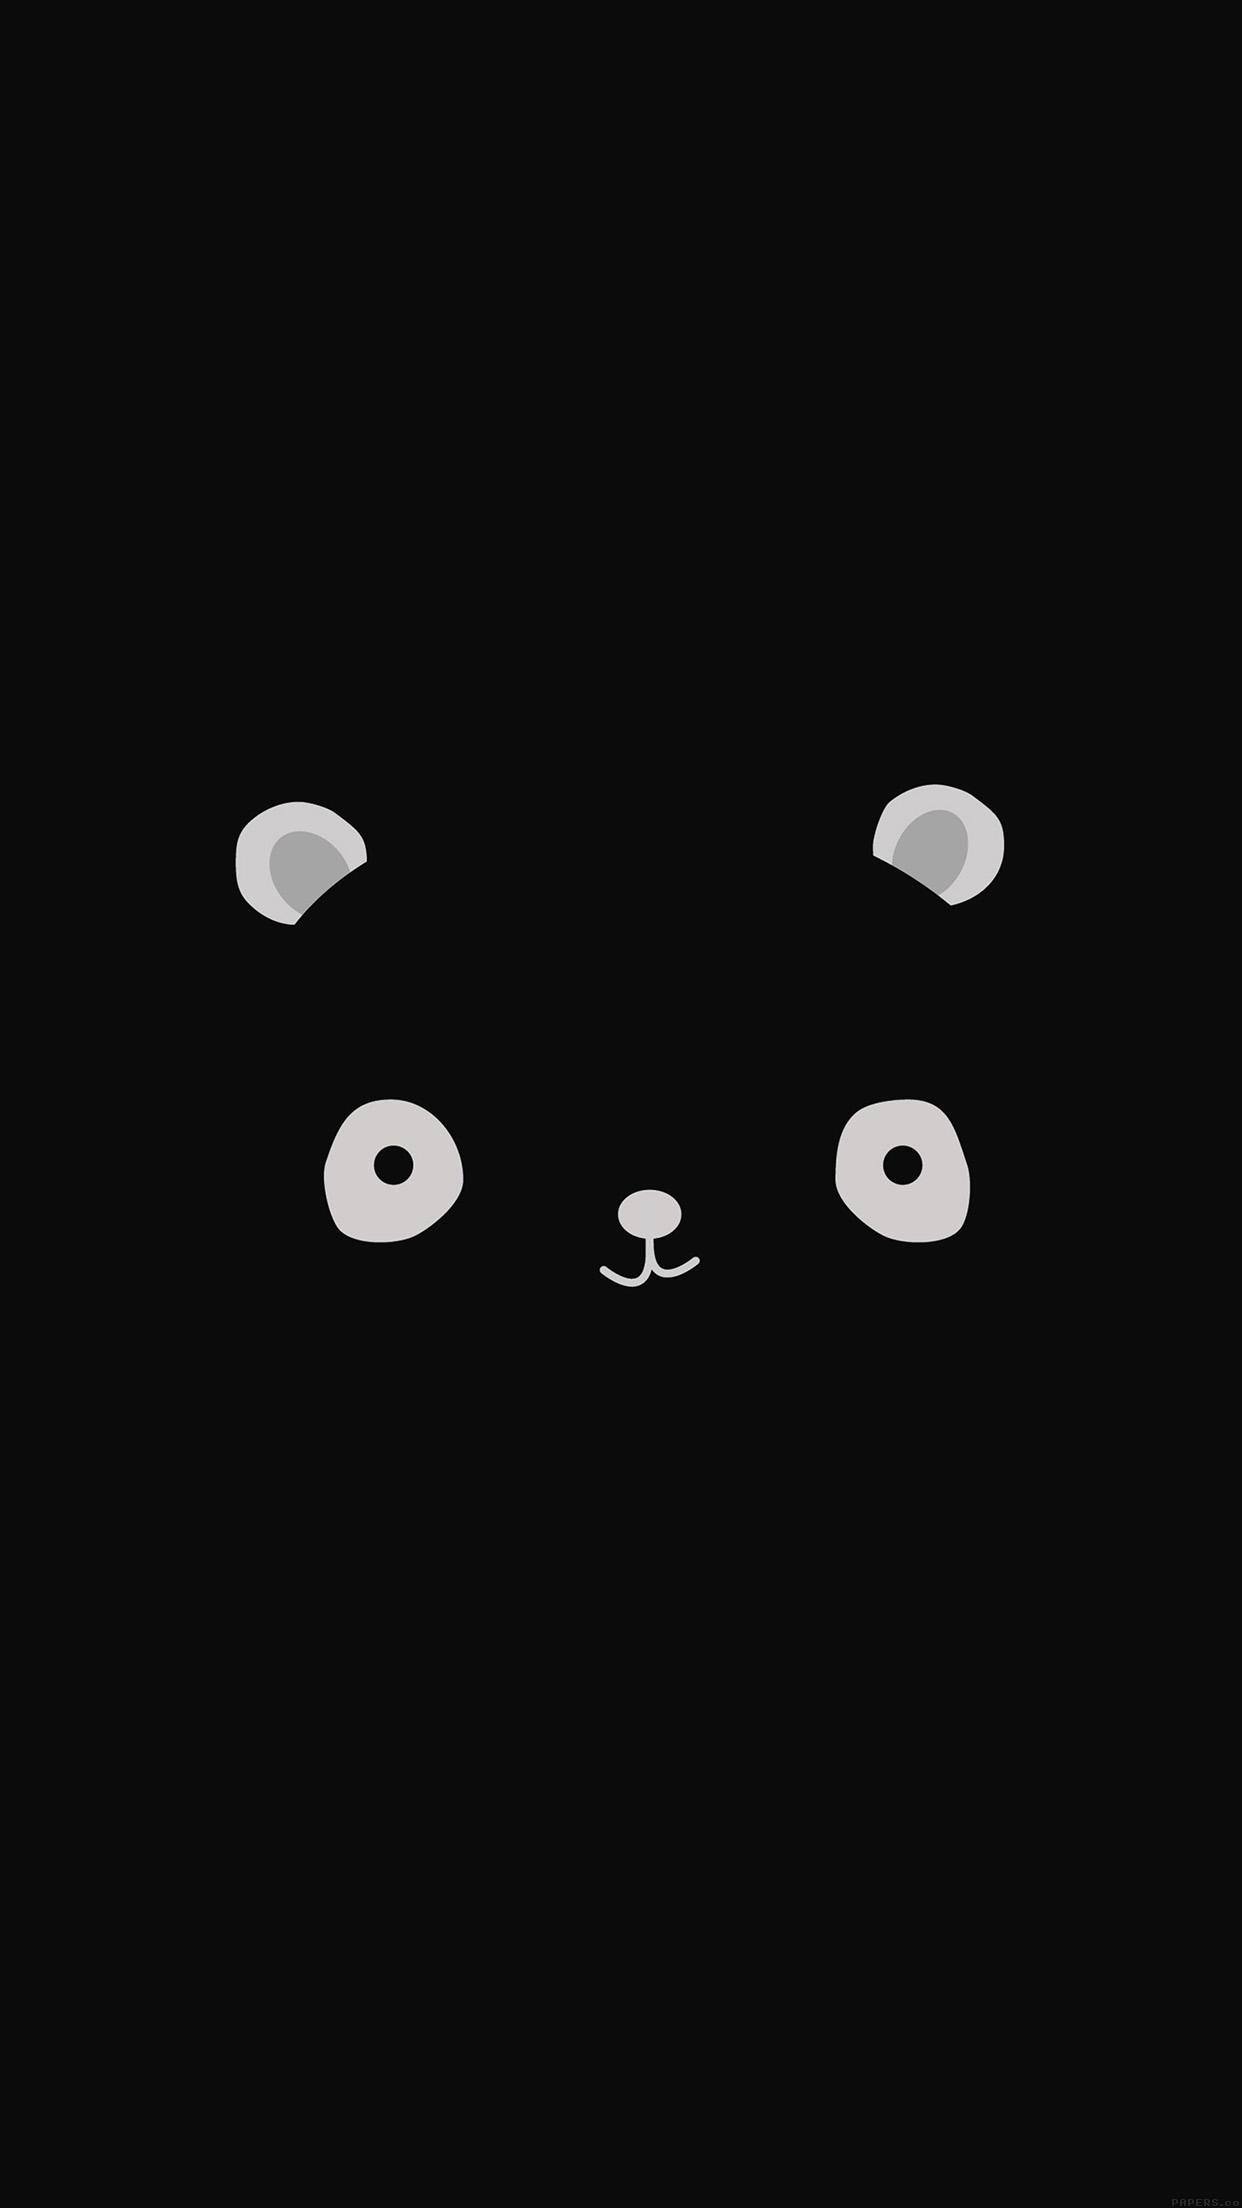 ag17-cute-minimal-panda-dark-illust-art - Papers.co